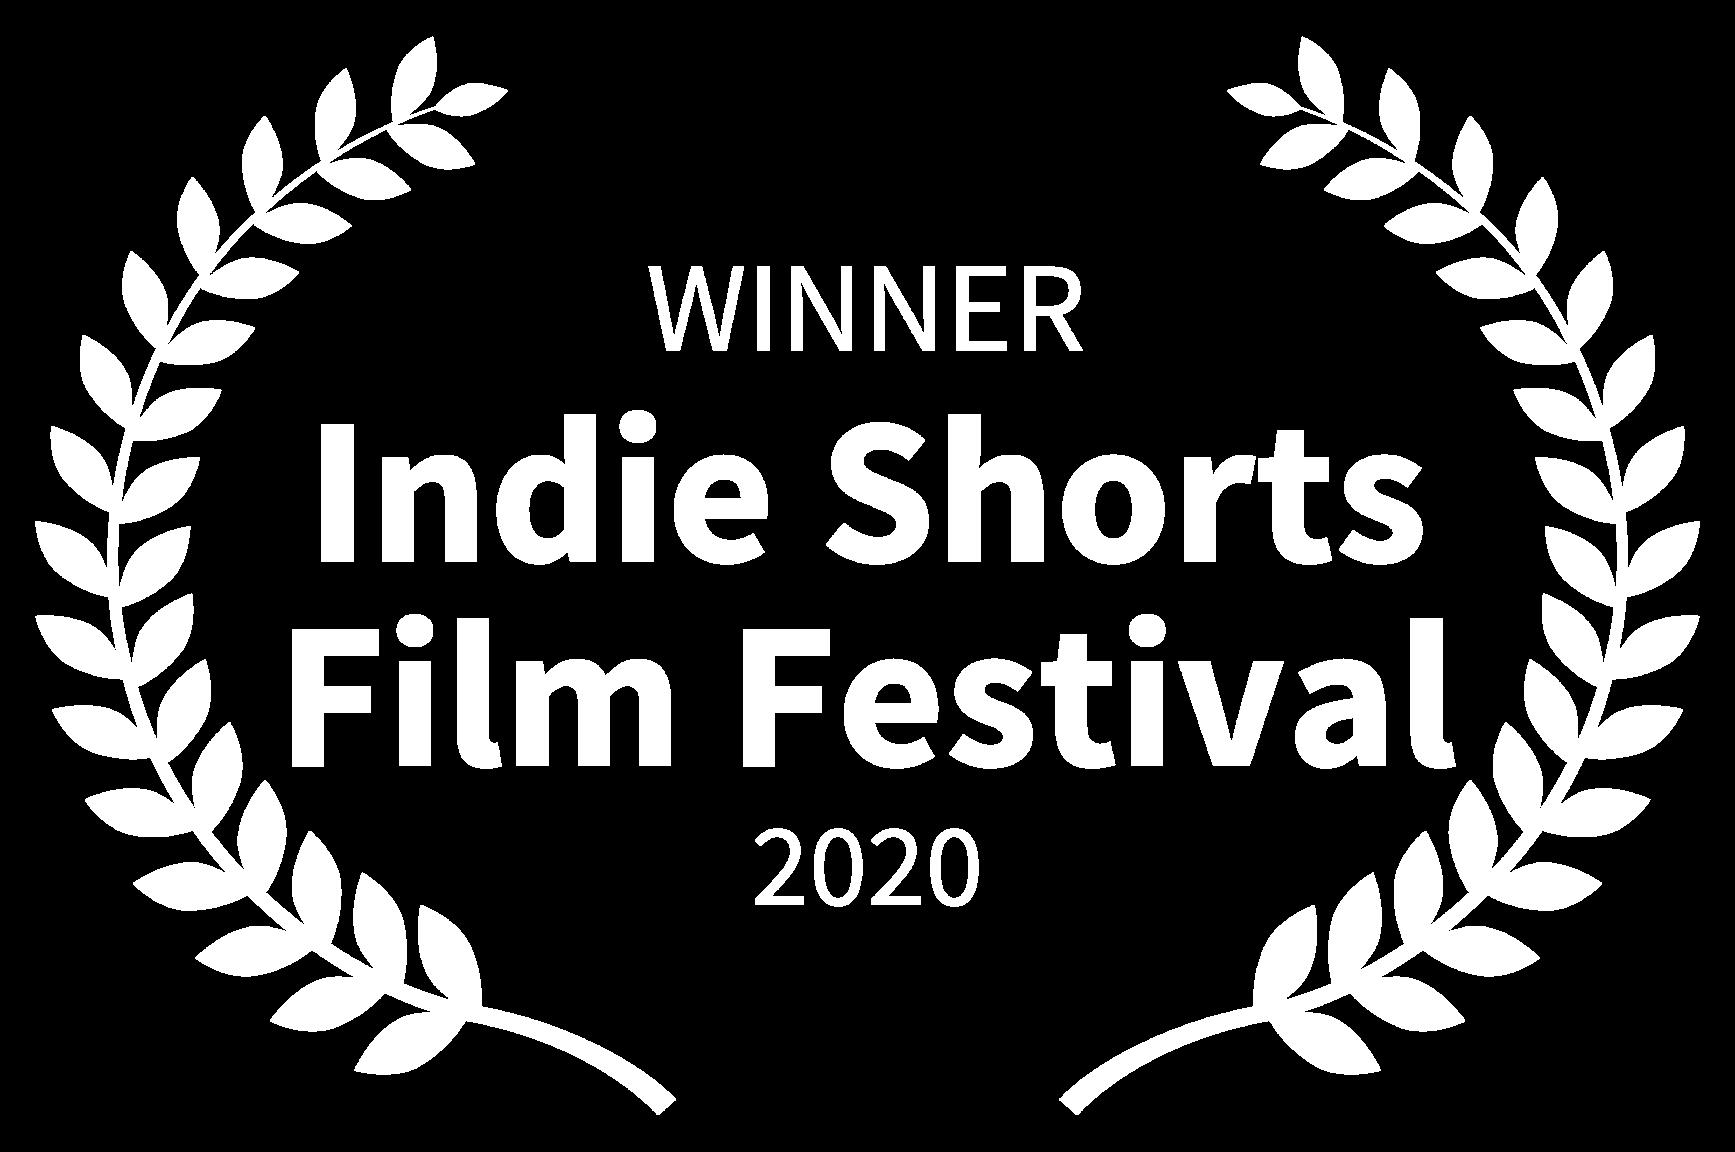 WINNER - Indie Shorts Film Festival - 2020